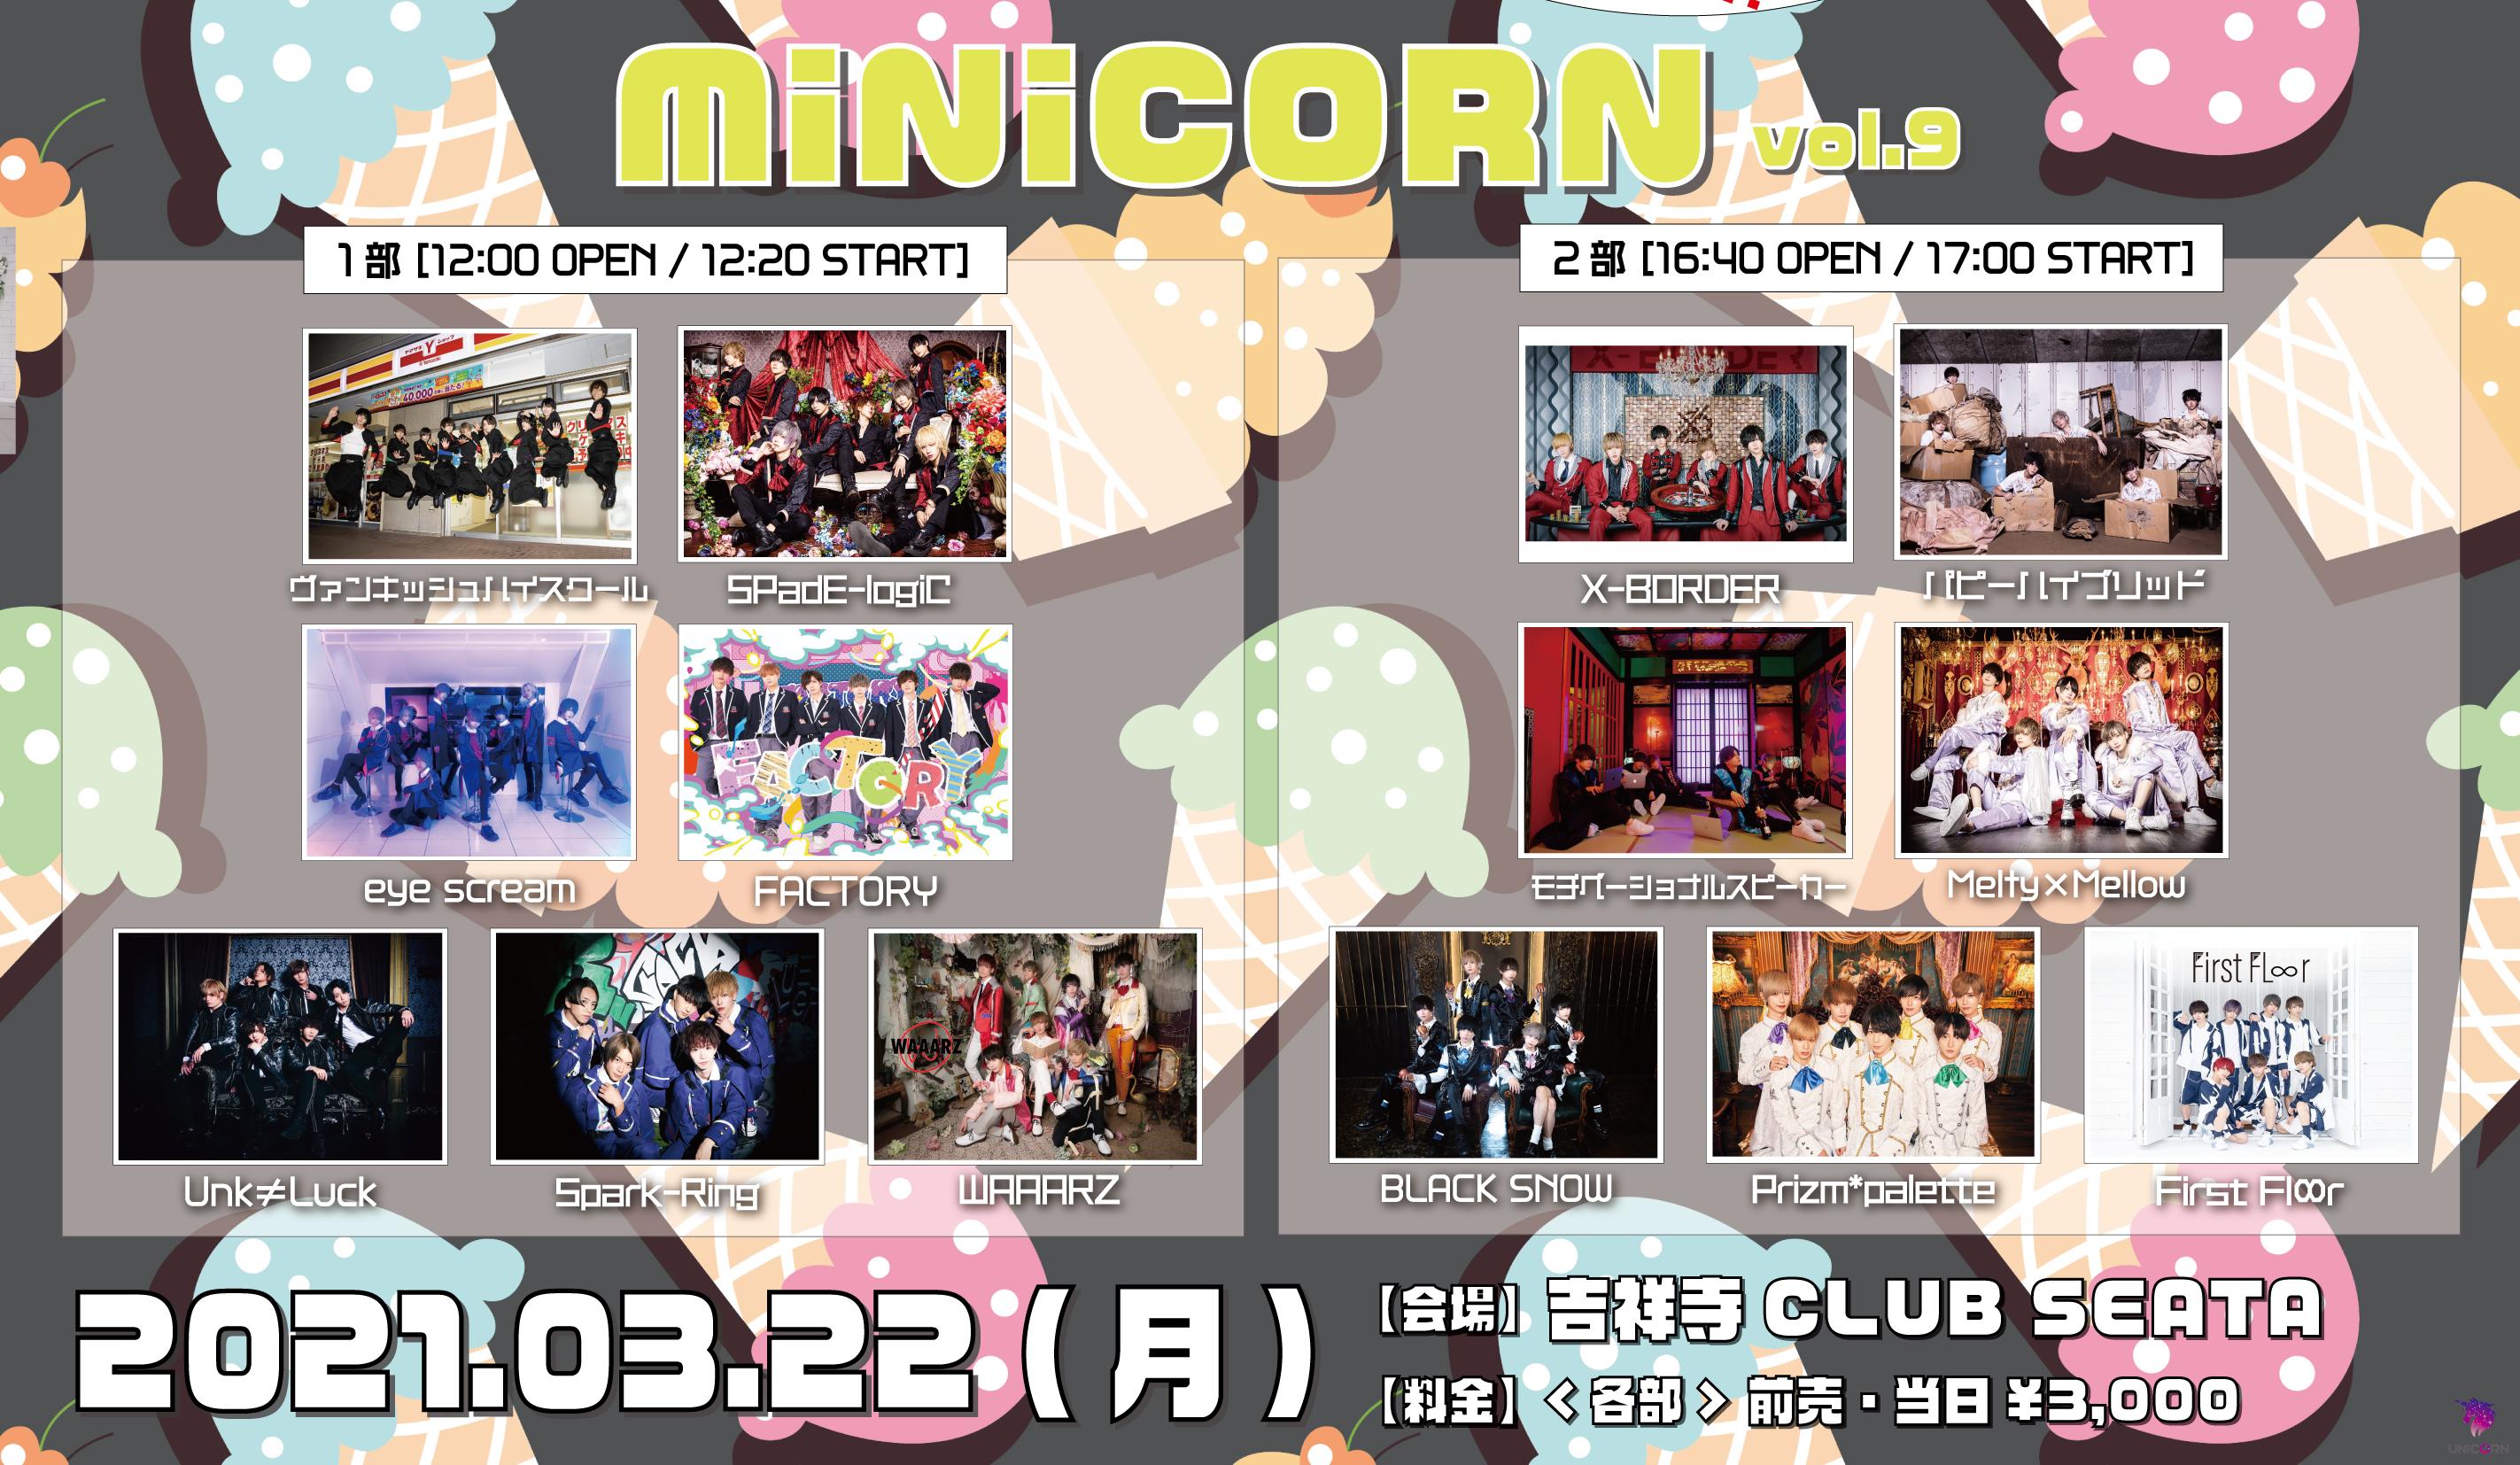 MiNiCORN vol.9【1部】